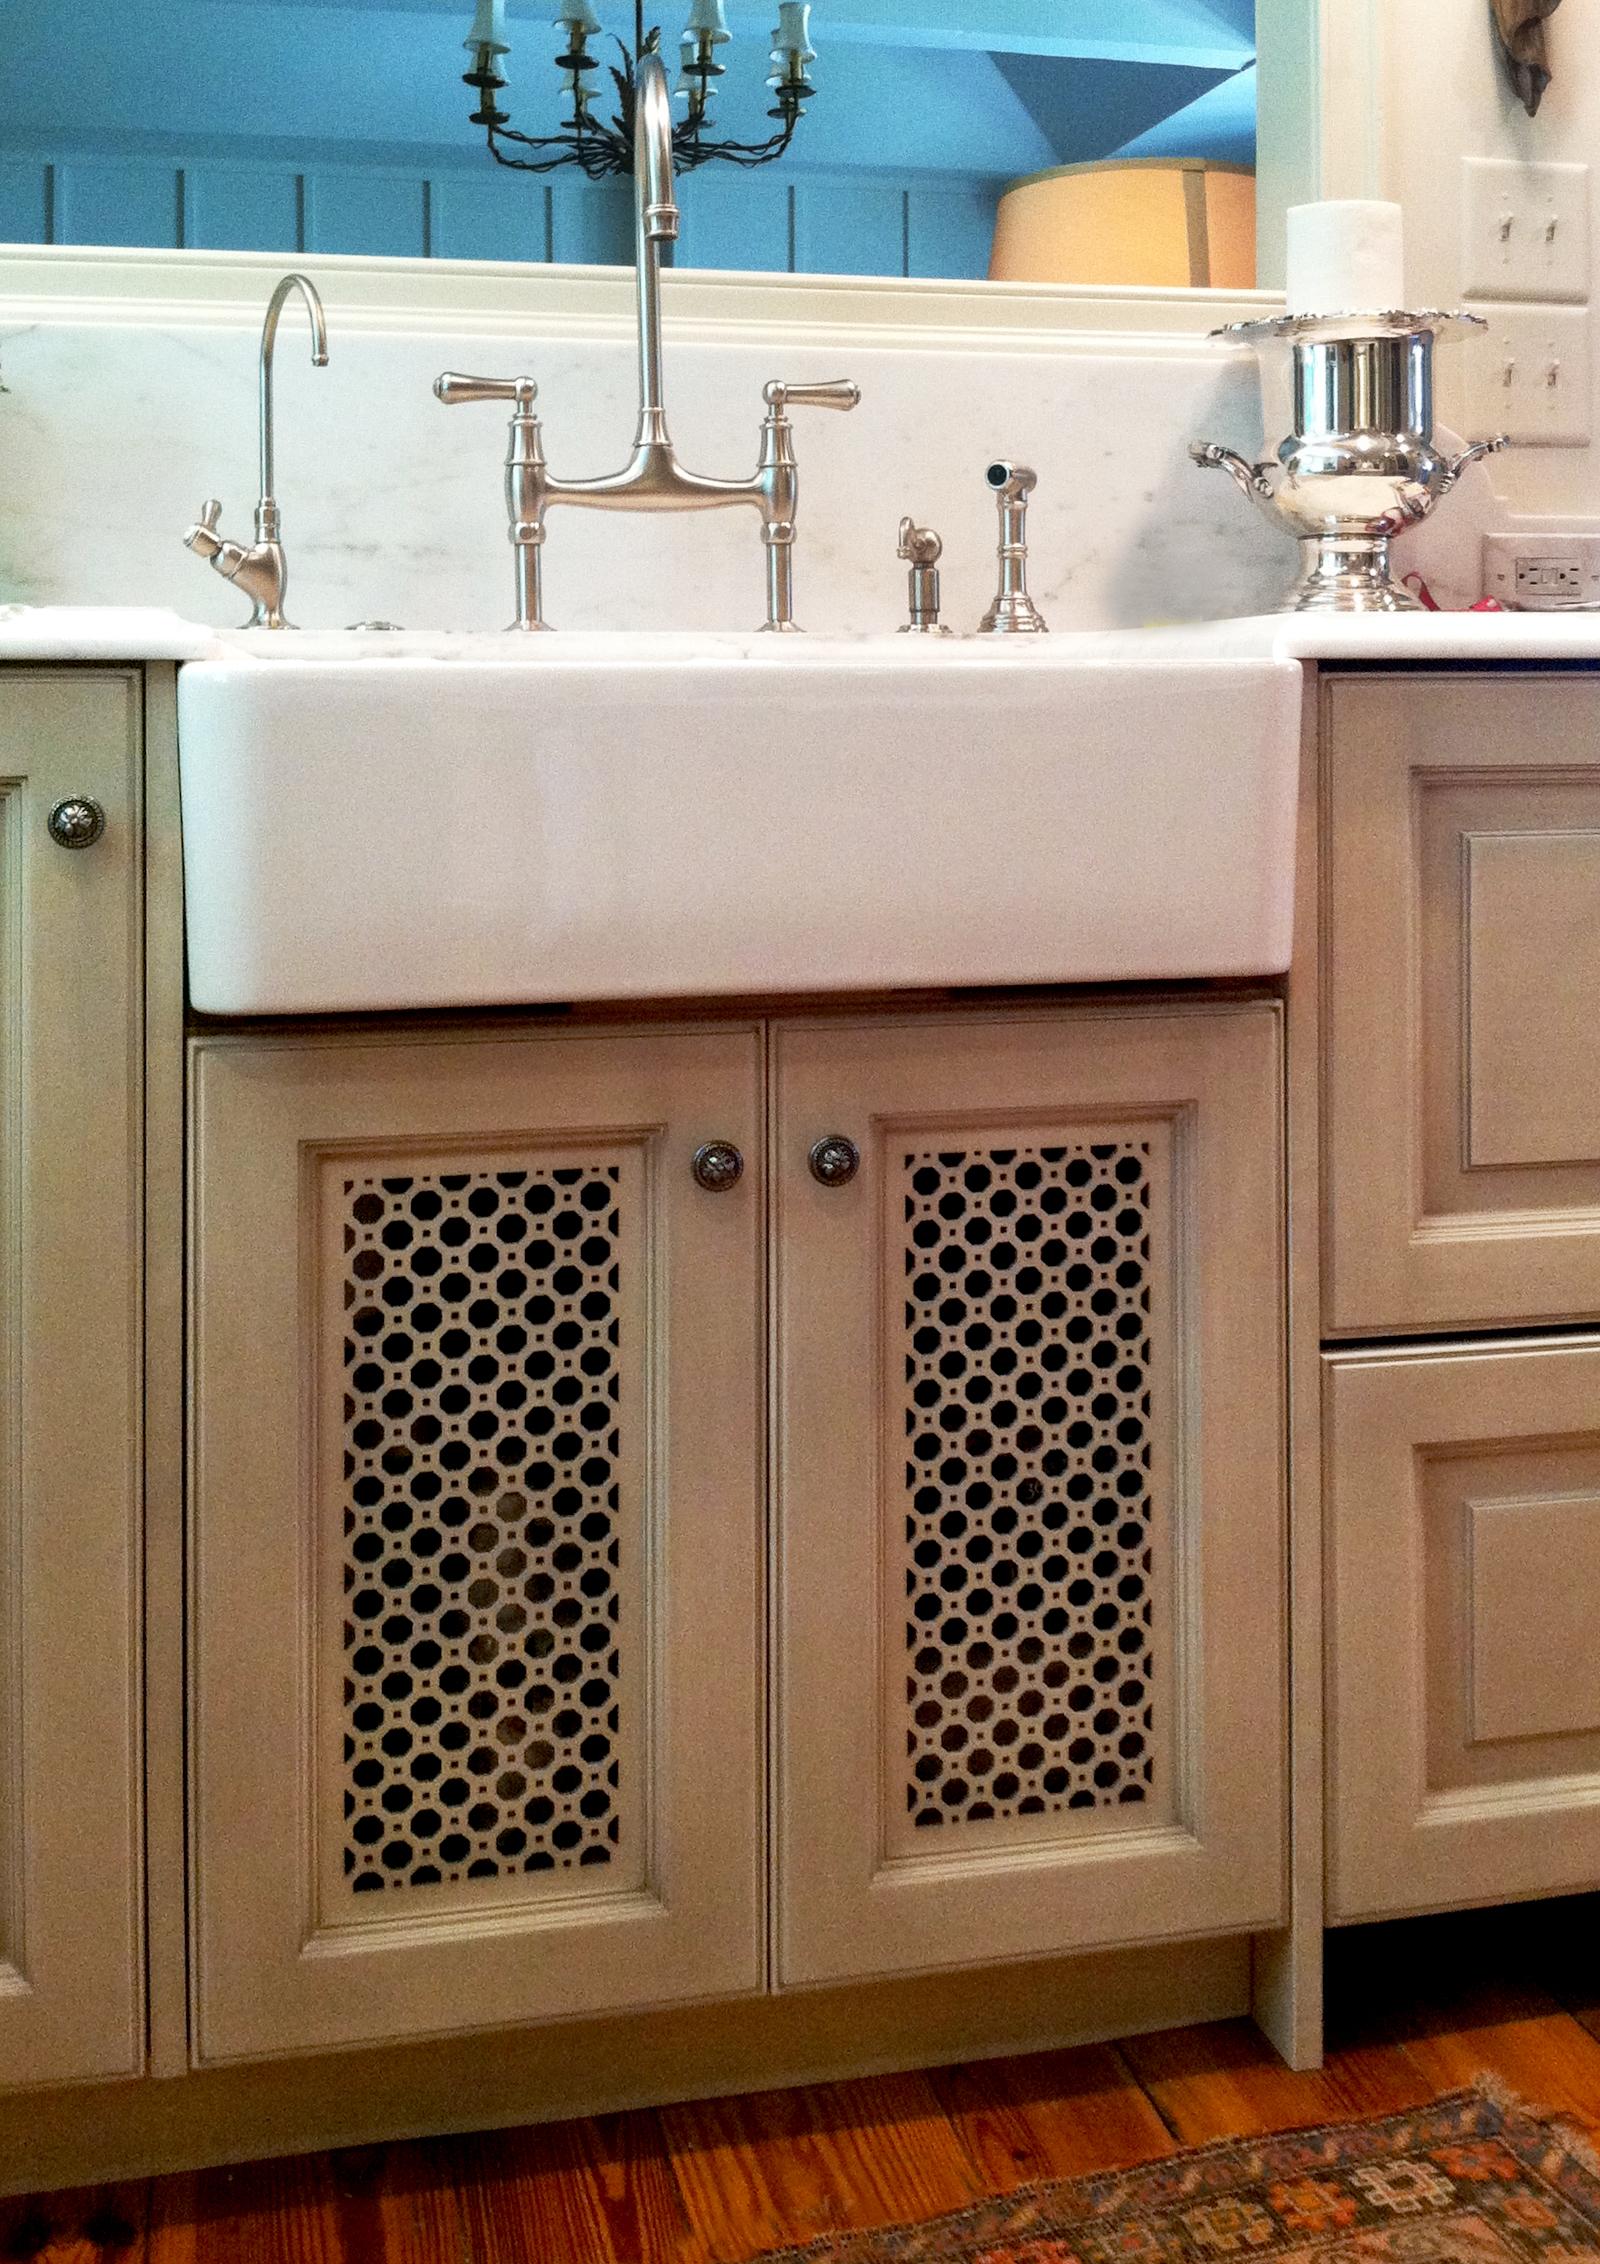 Design Galleria  Custom kitchen cabinet lattice pattern